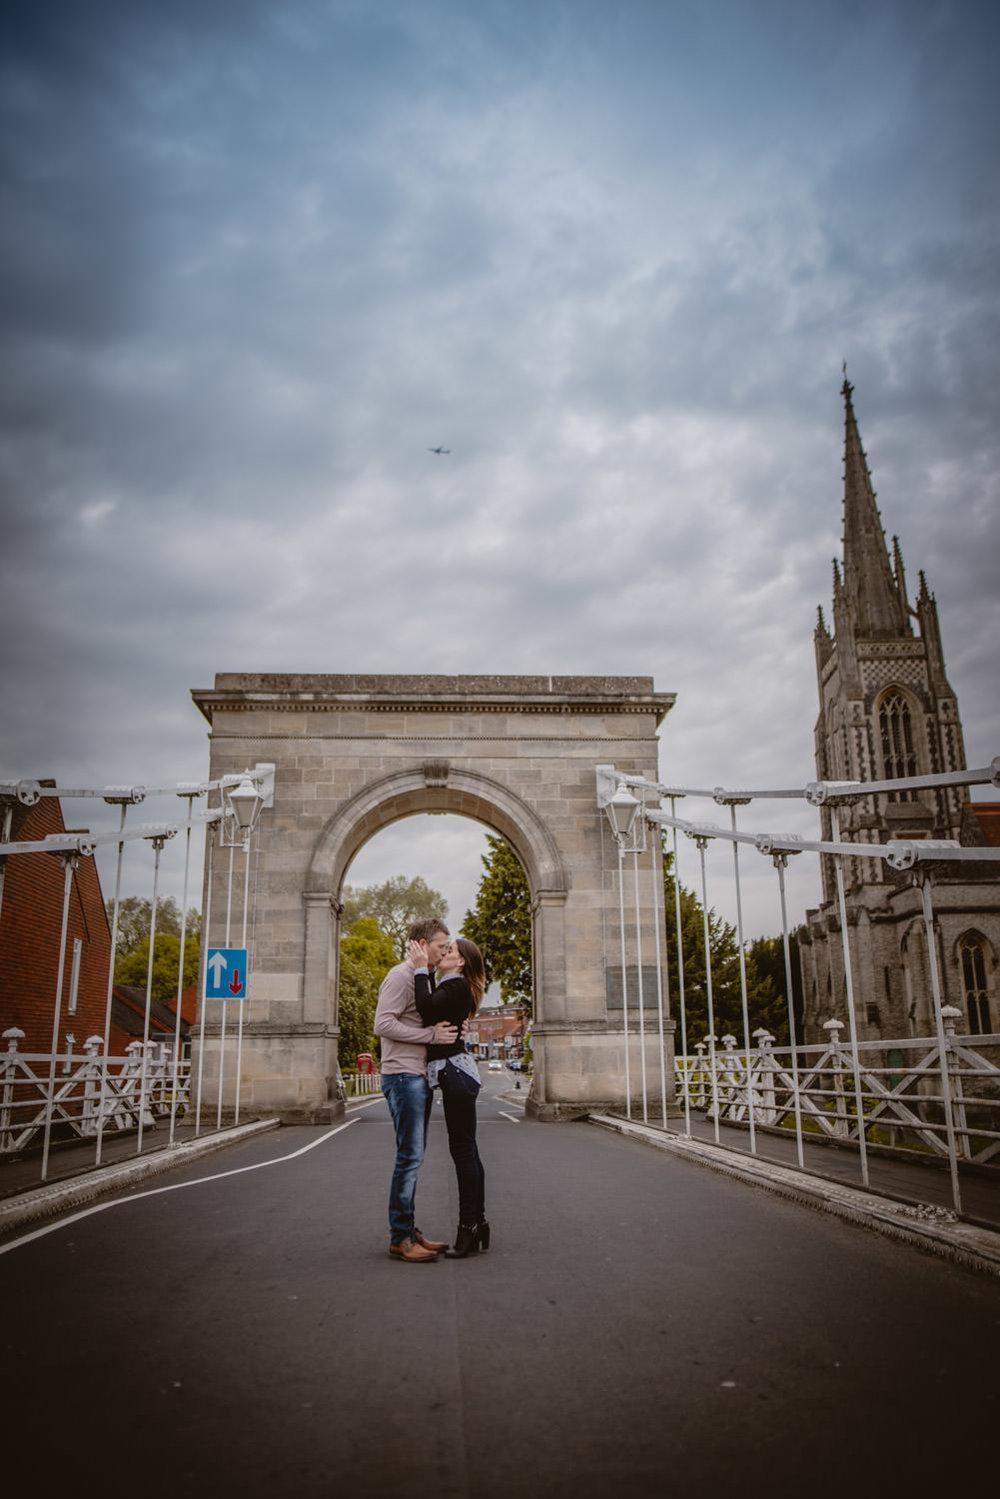 Marlow Bridge Engagement photos